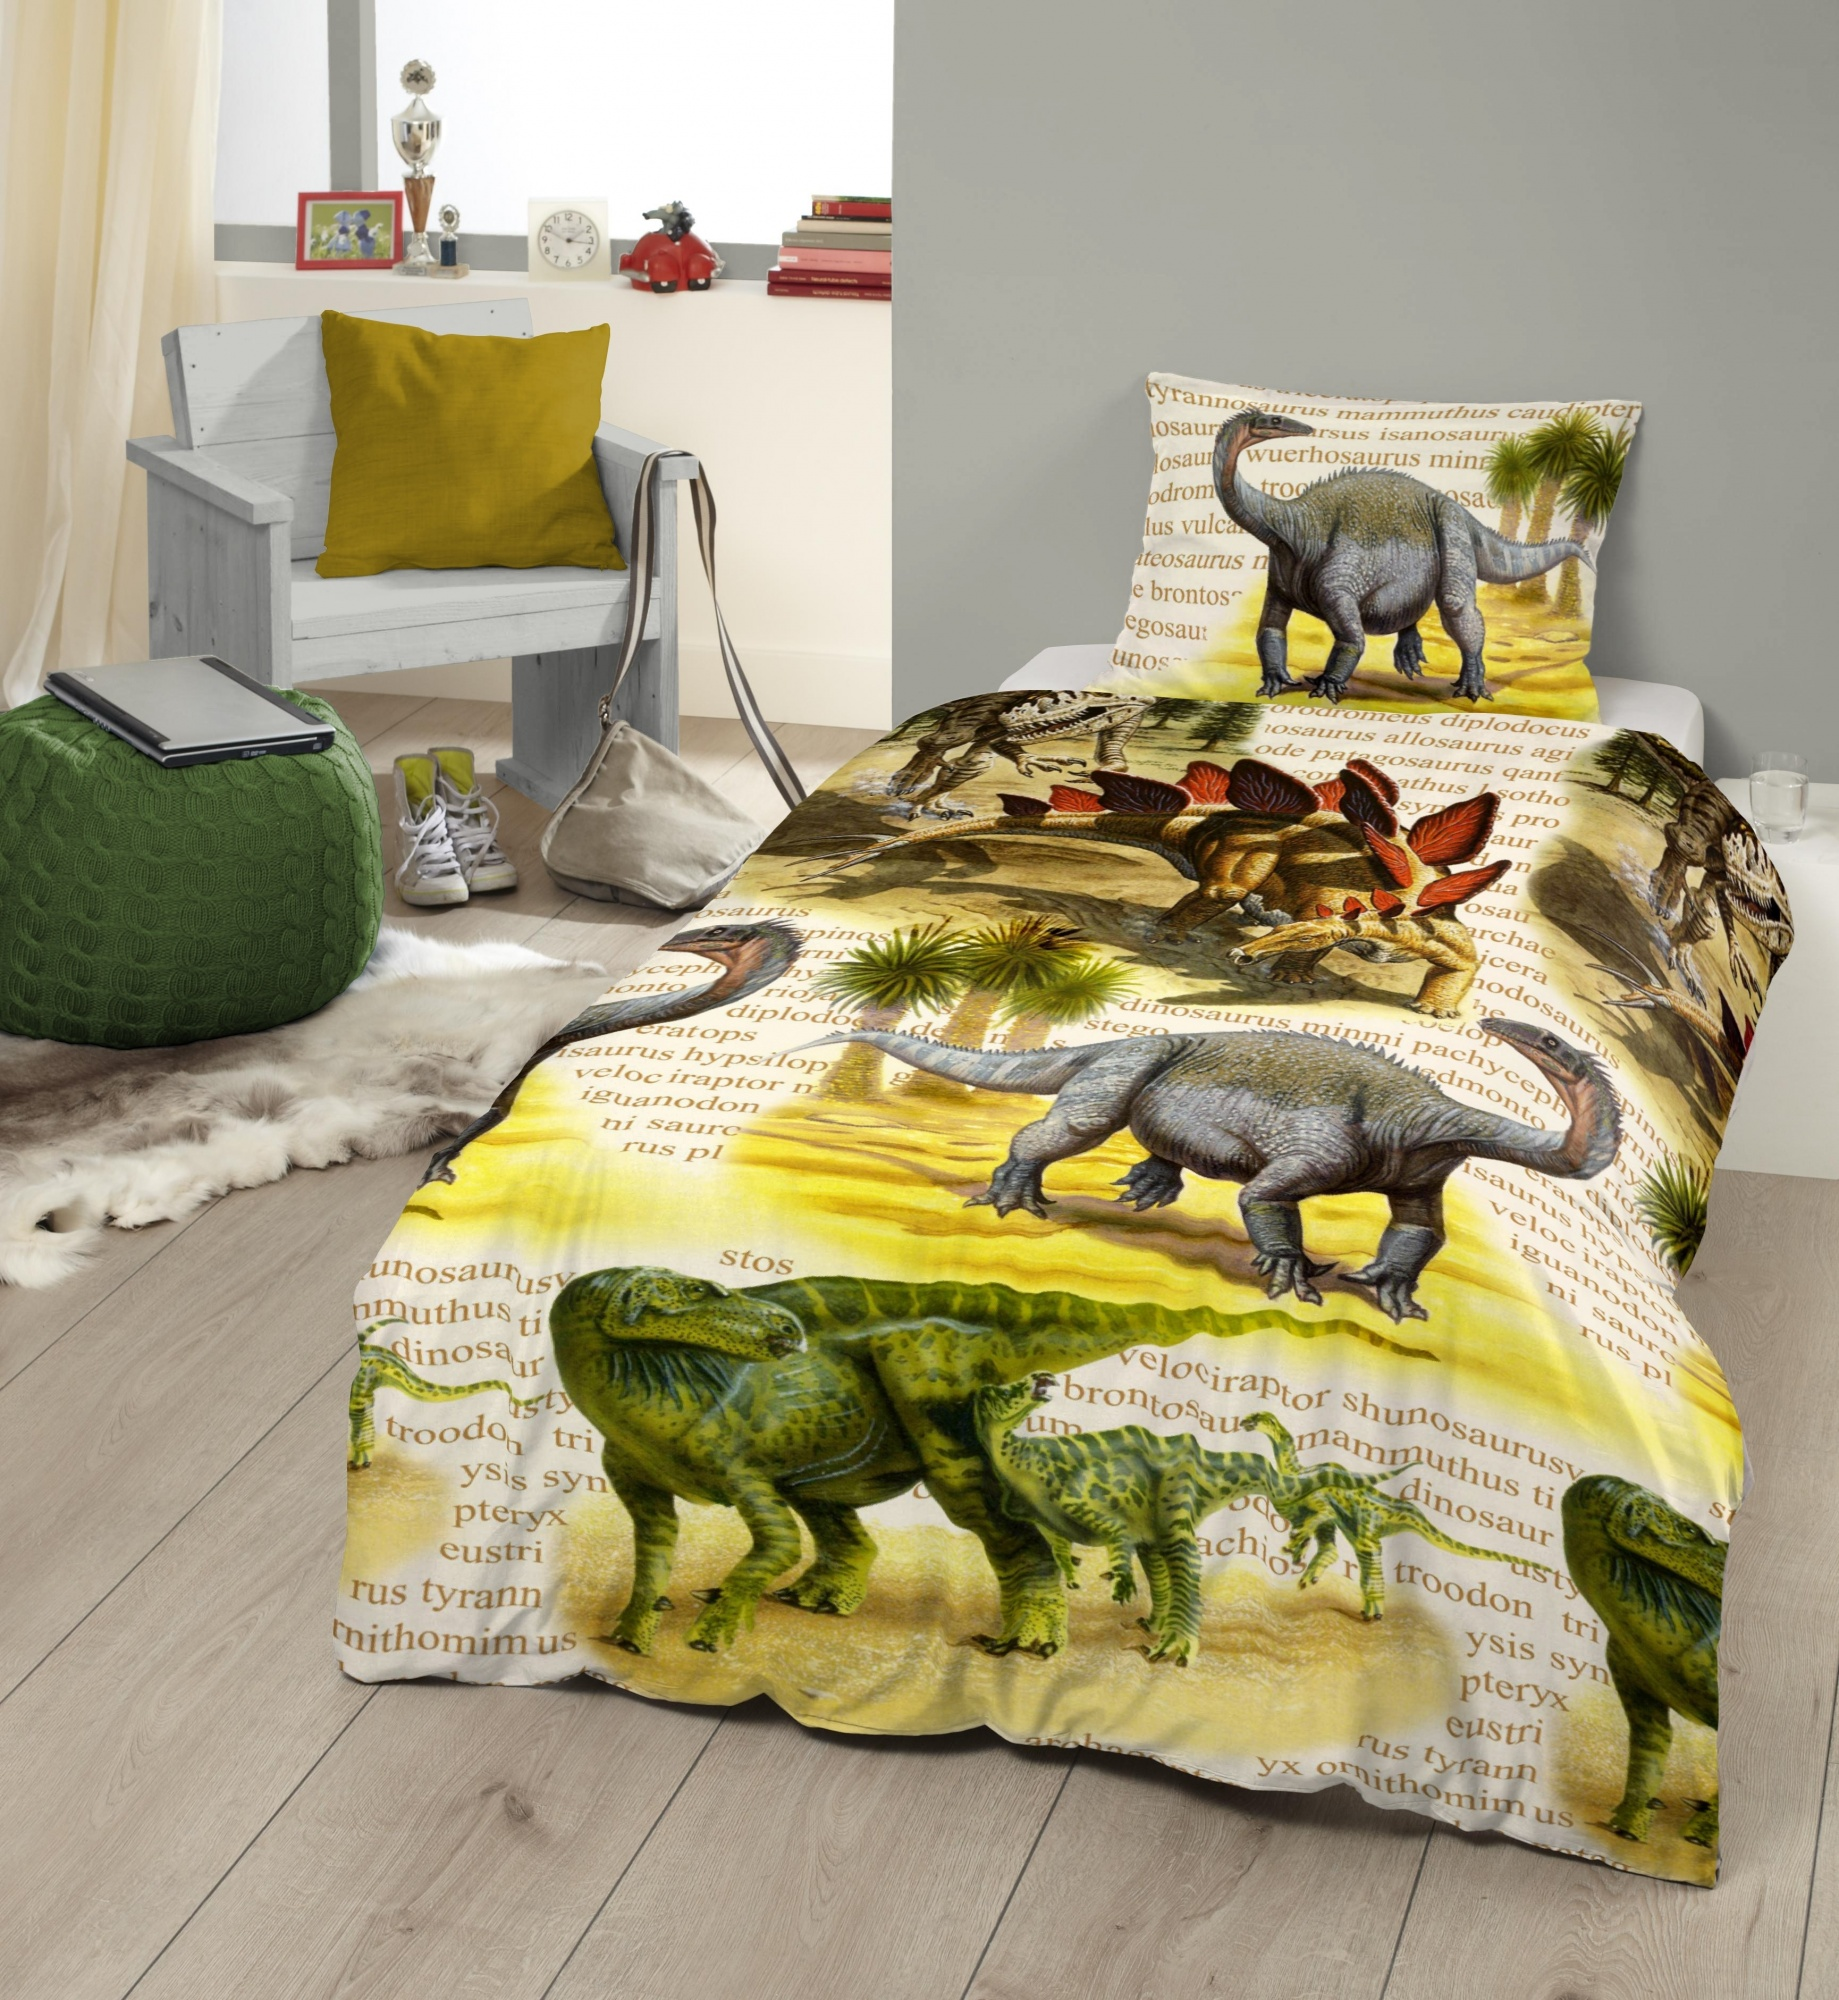 Good Morning dekbedovertrek Dino 140 x 200 220 cm geel